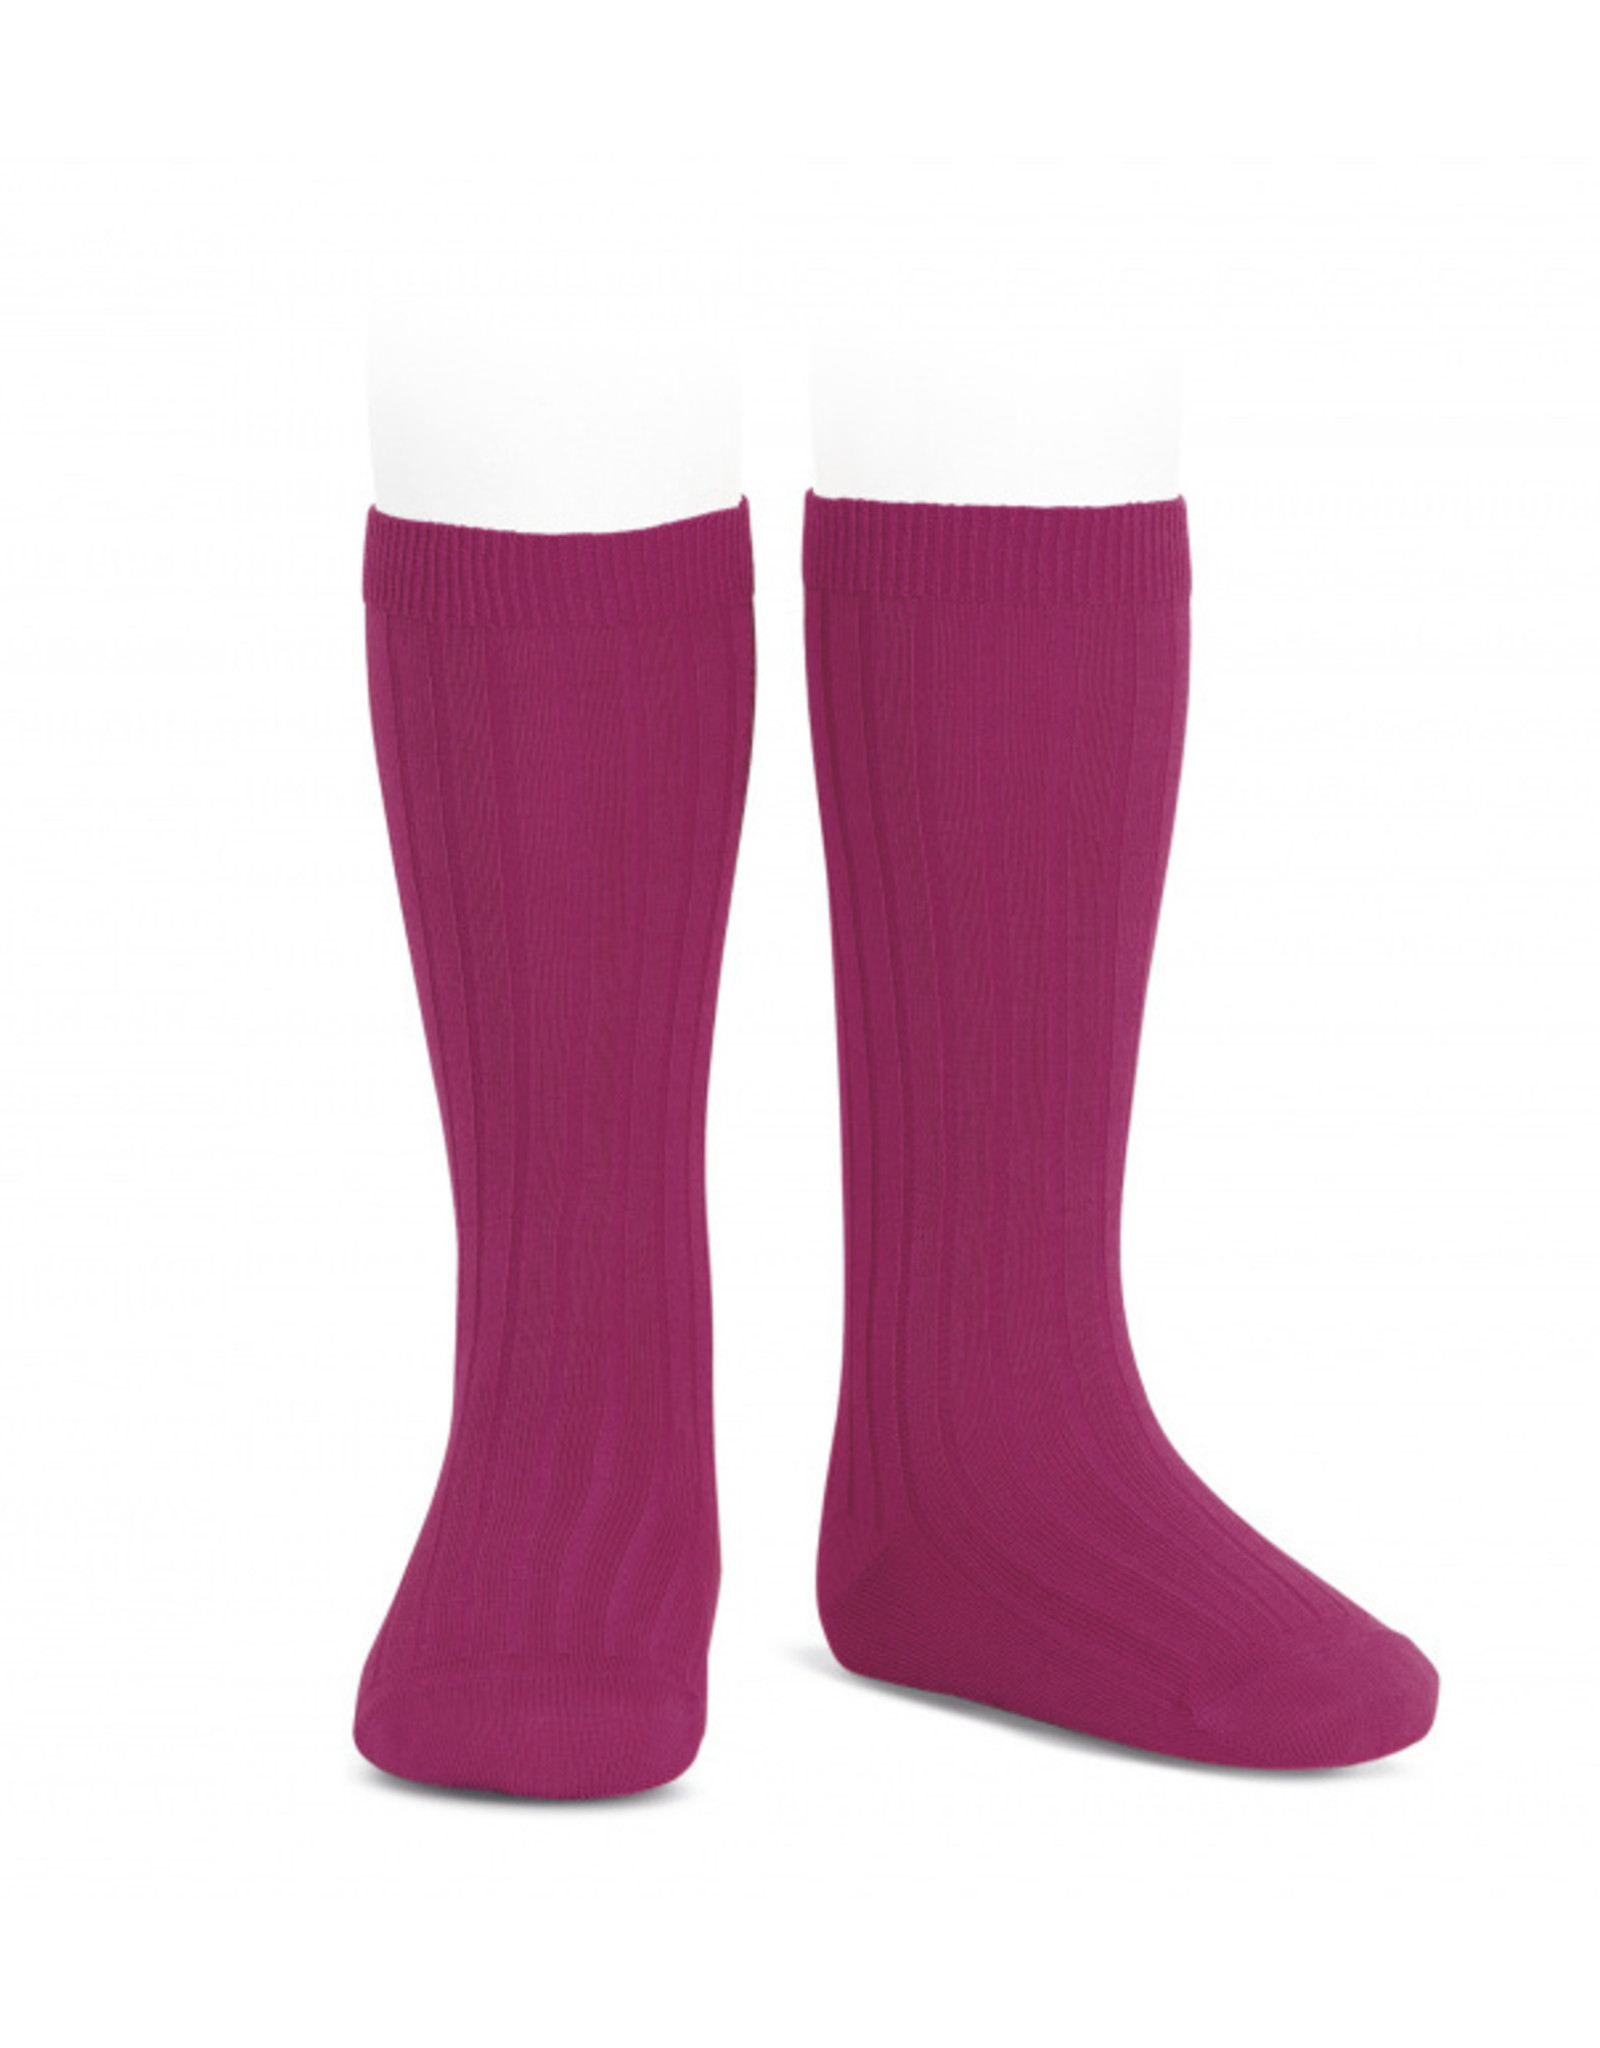 CONDOR Petunia Ribbed Knee Socks